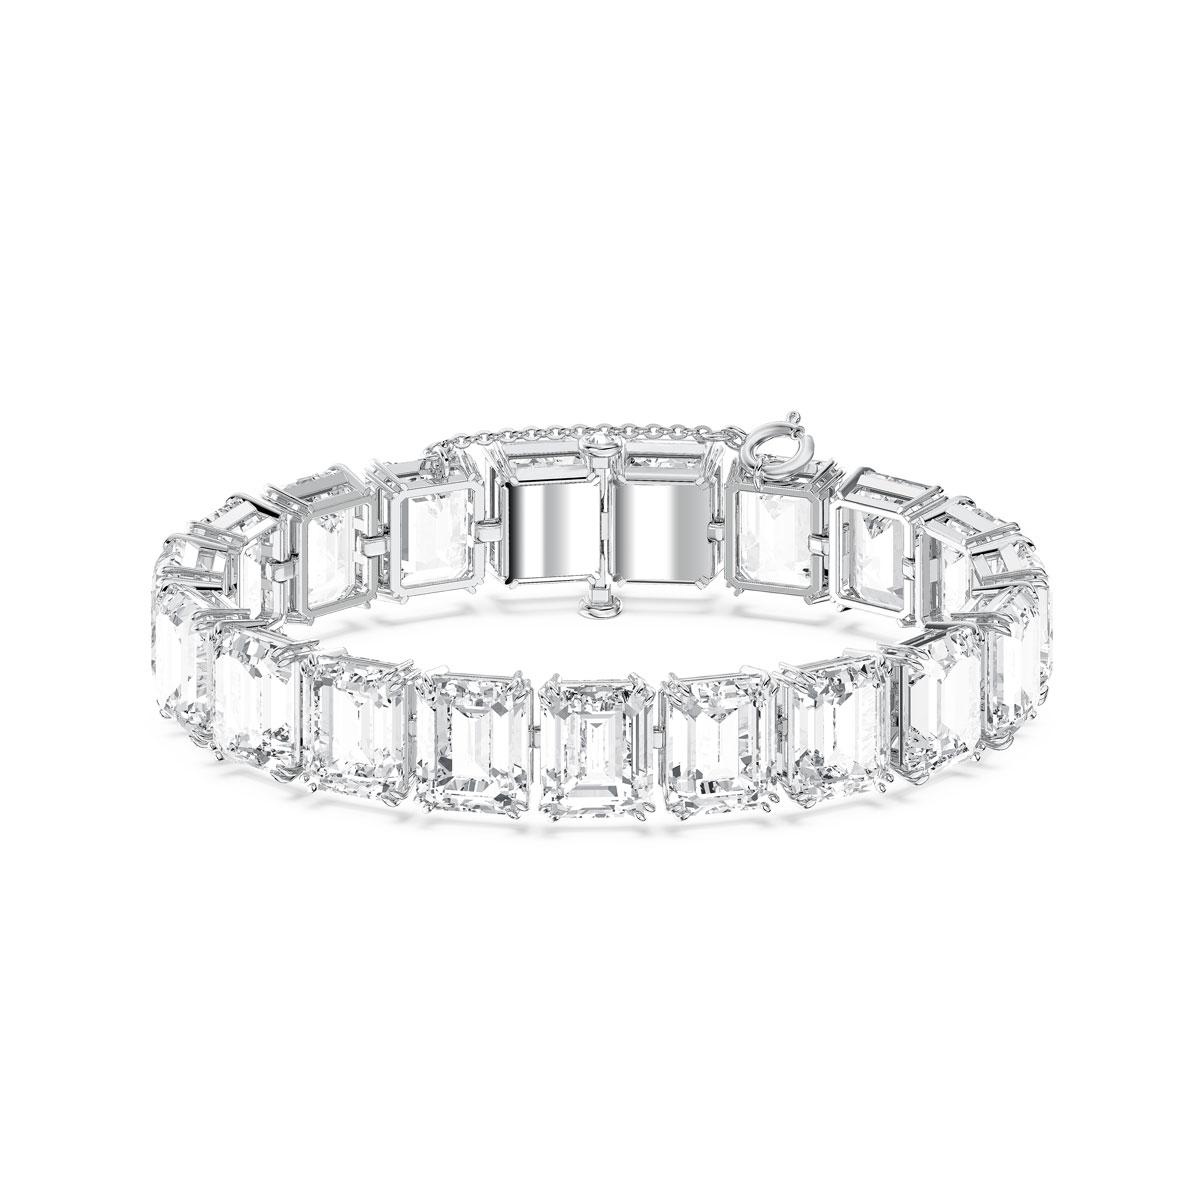 Swarovski Millenia Bracelet, Small Octagon Cut Crystals, White, Rhodium Plated